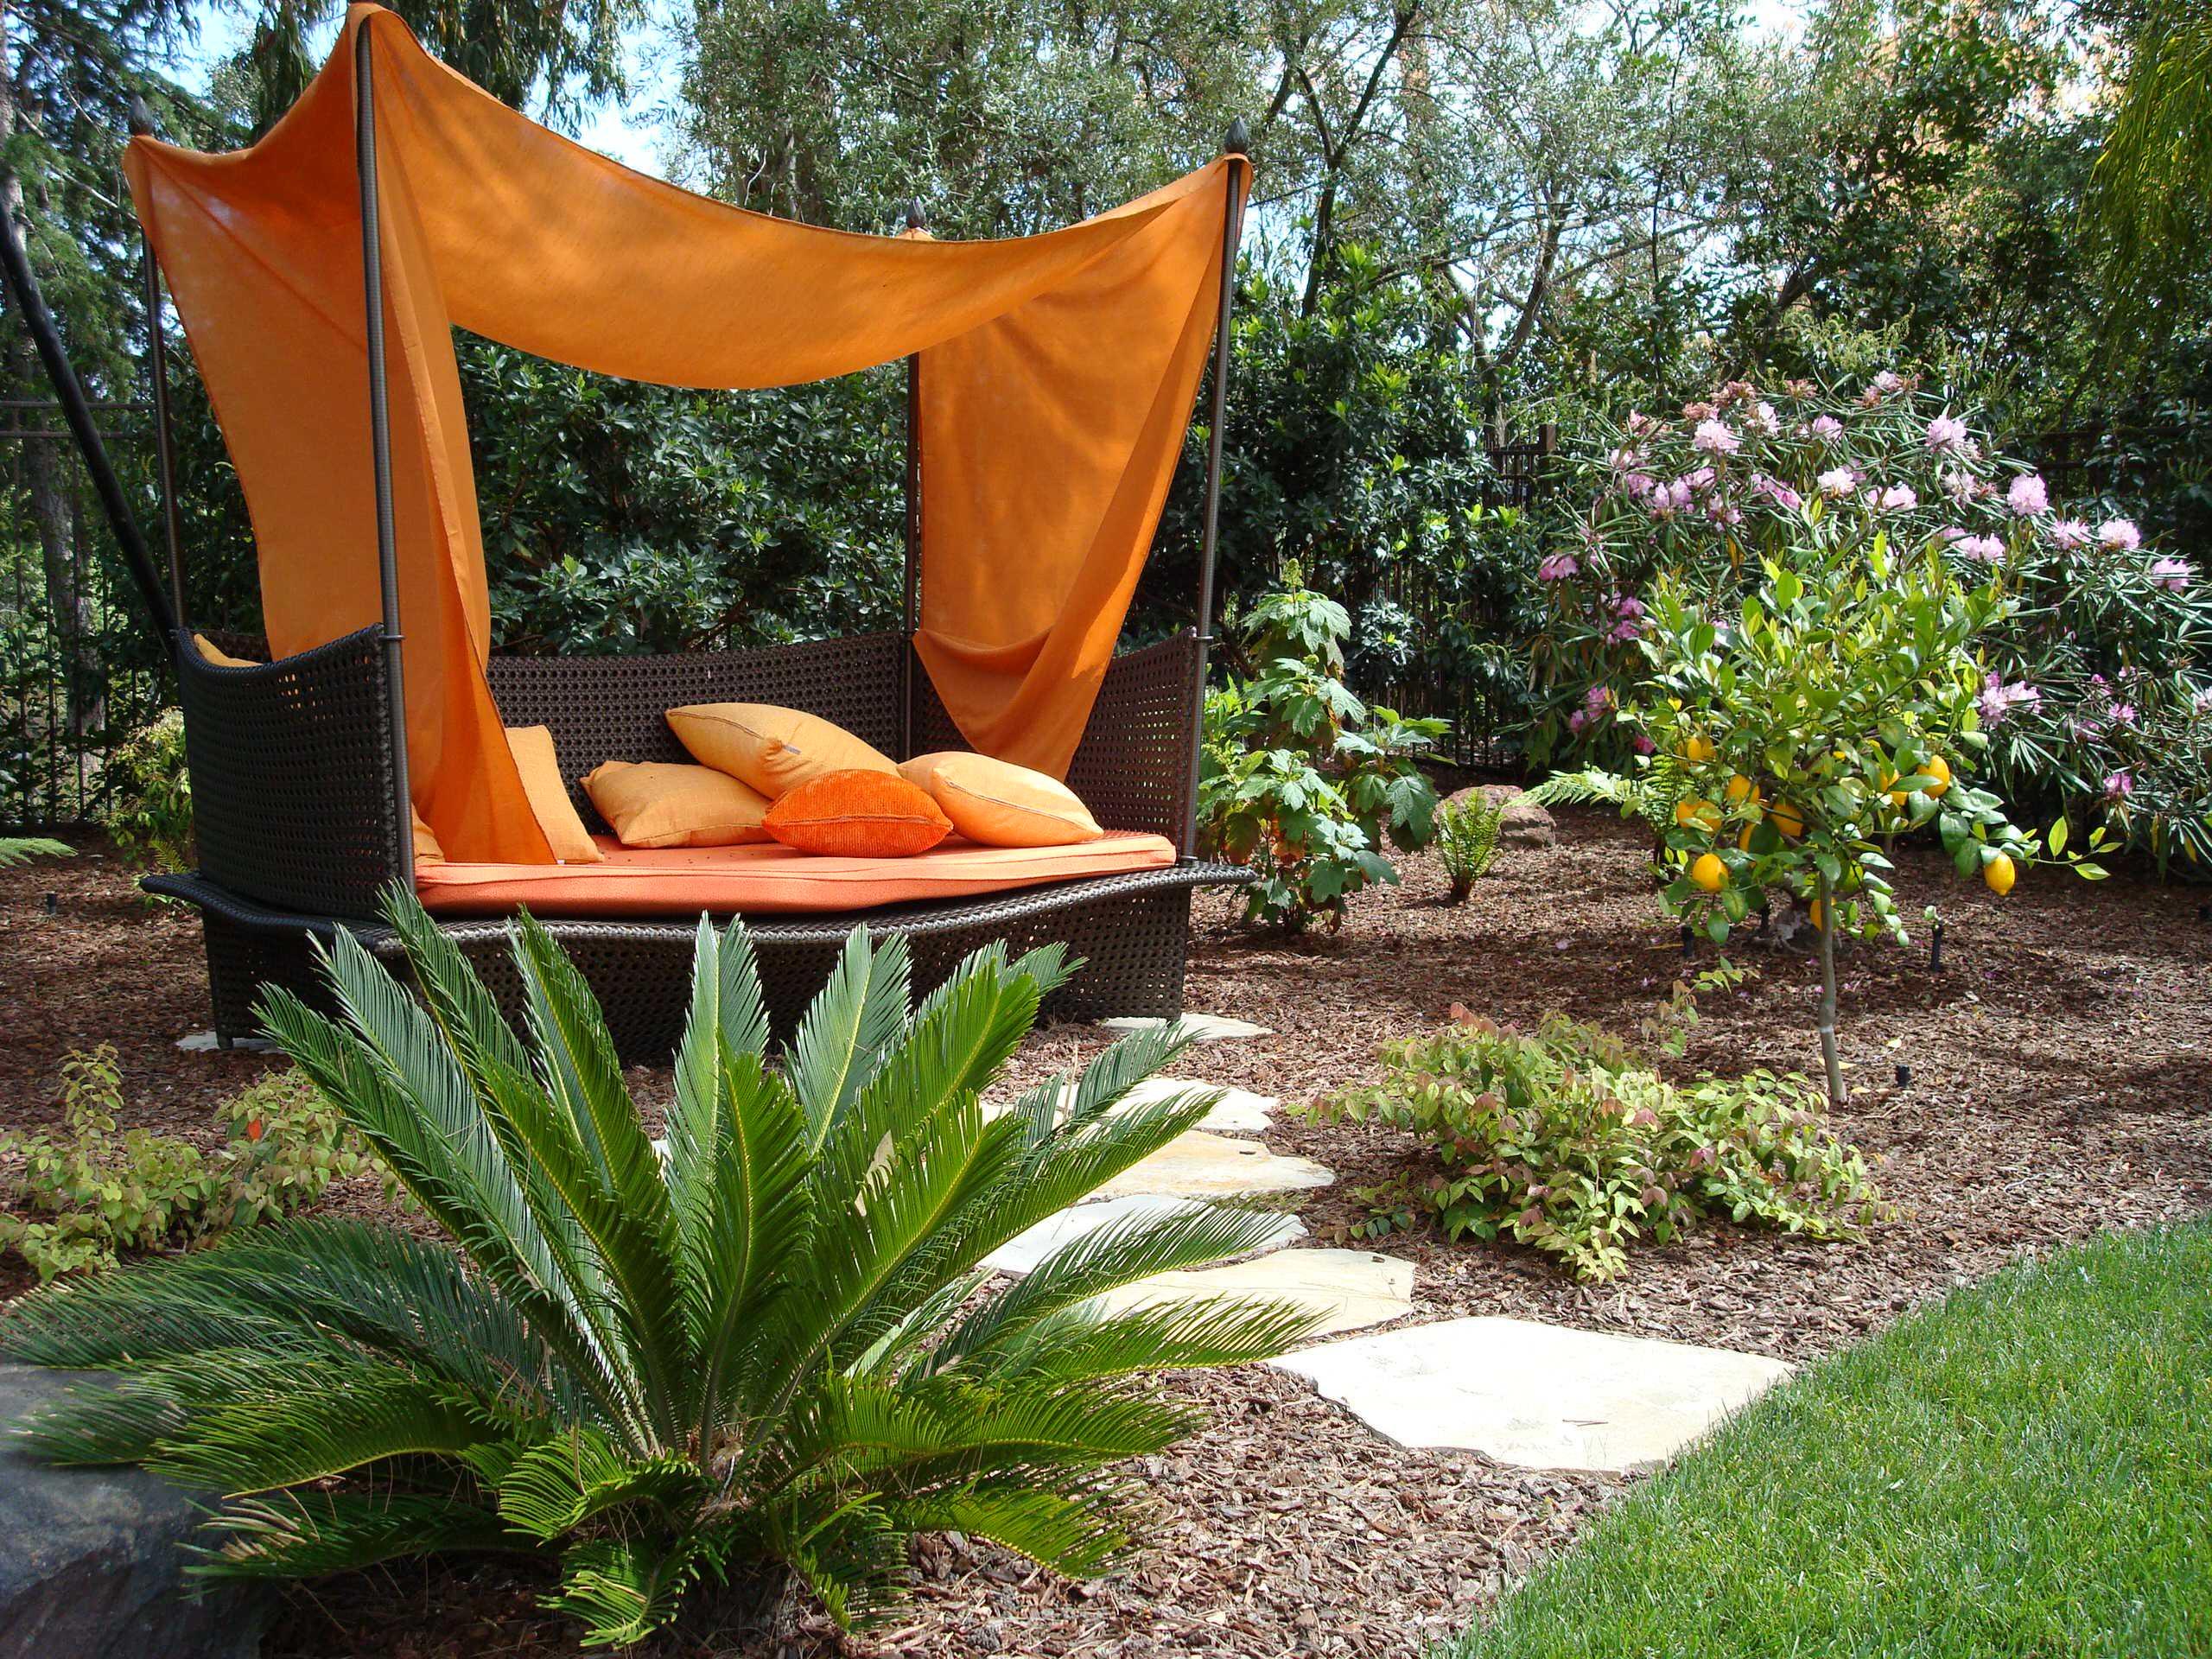 Outdoor Landscape Decor  16 Delightful Modern Landscape Ideas That Will Update Your